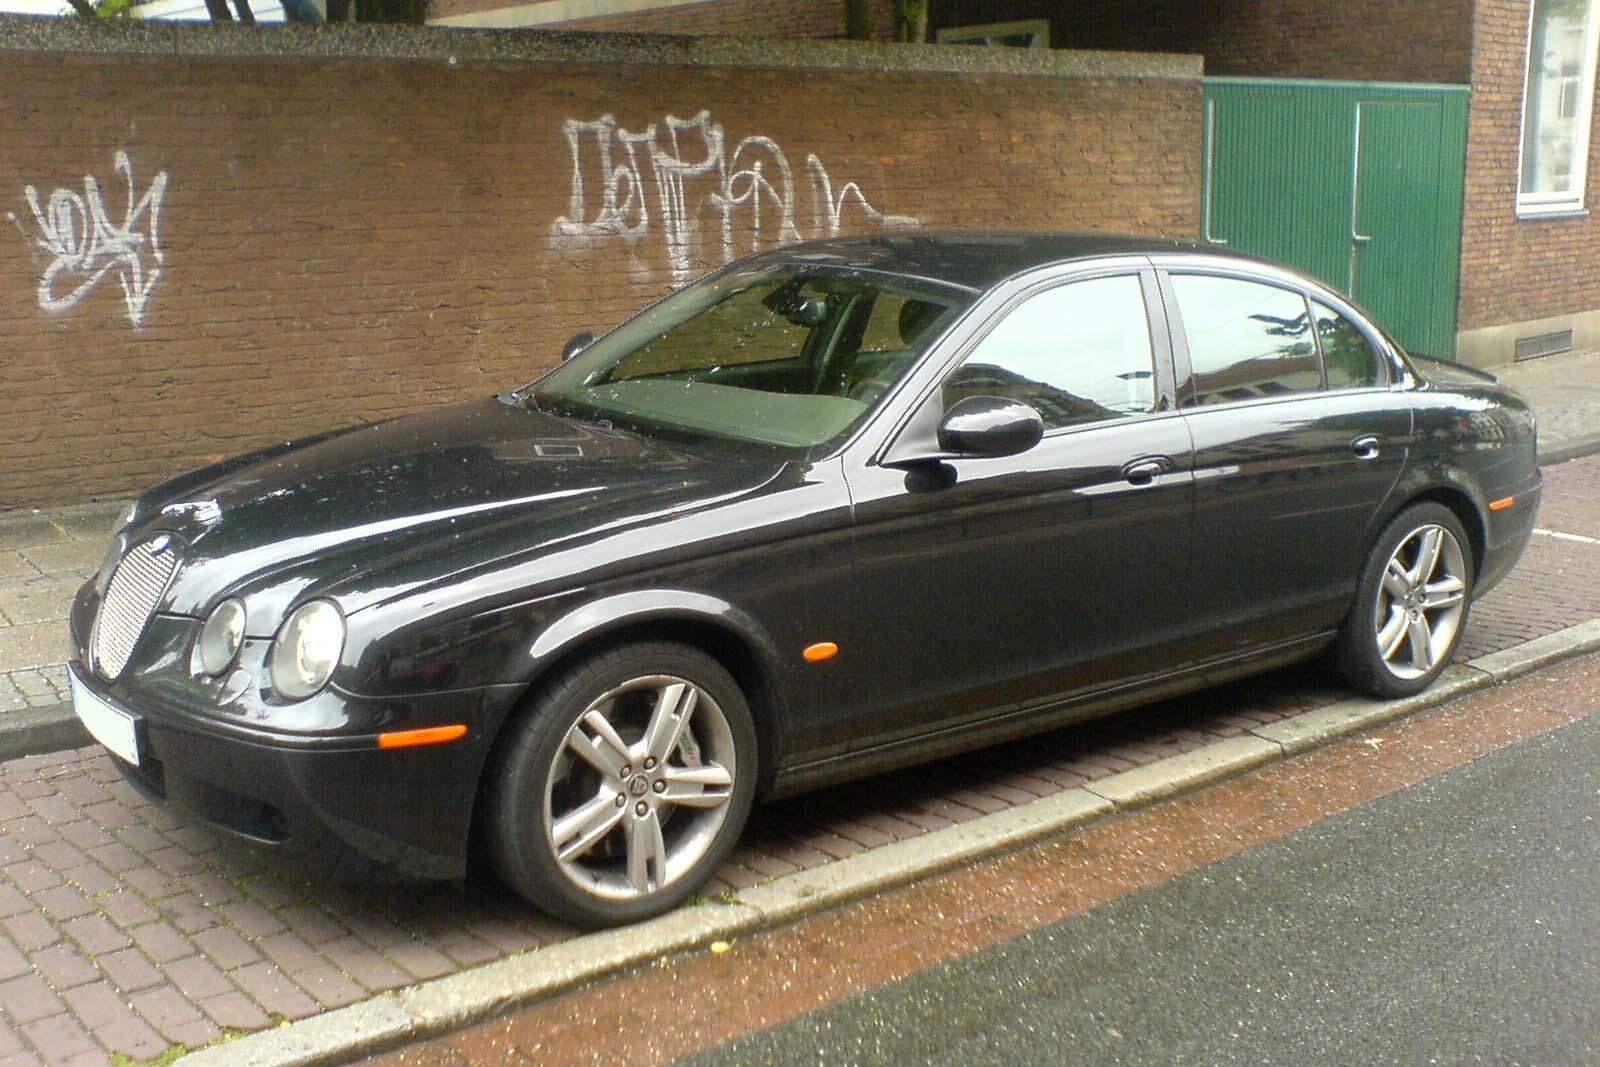 File:Jaguar S-Type R schwarz vl.jpg - Wikimedia Commons